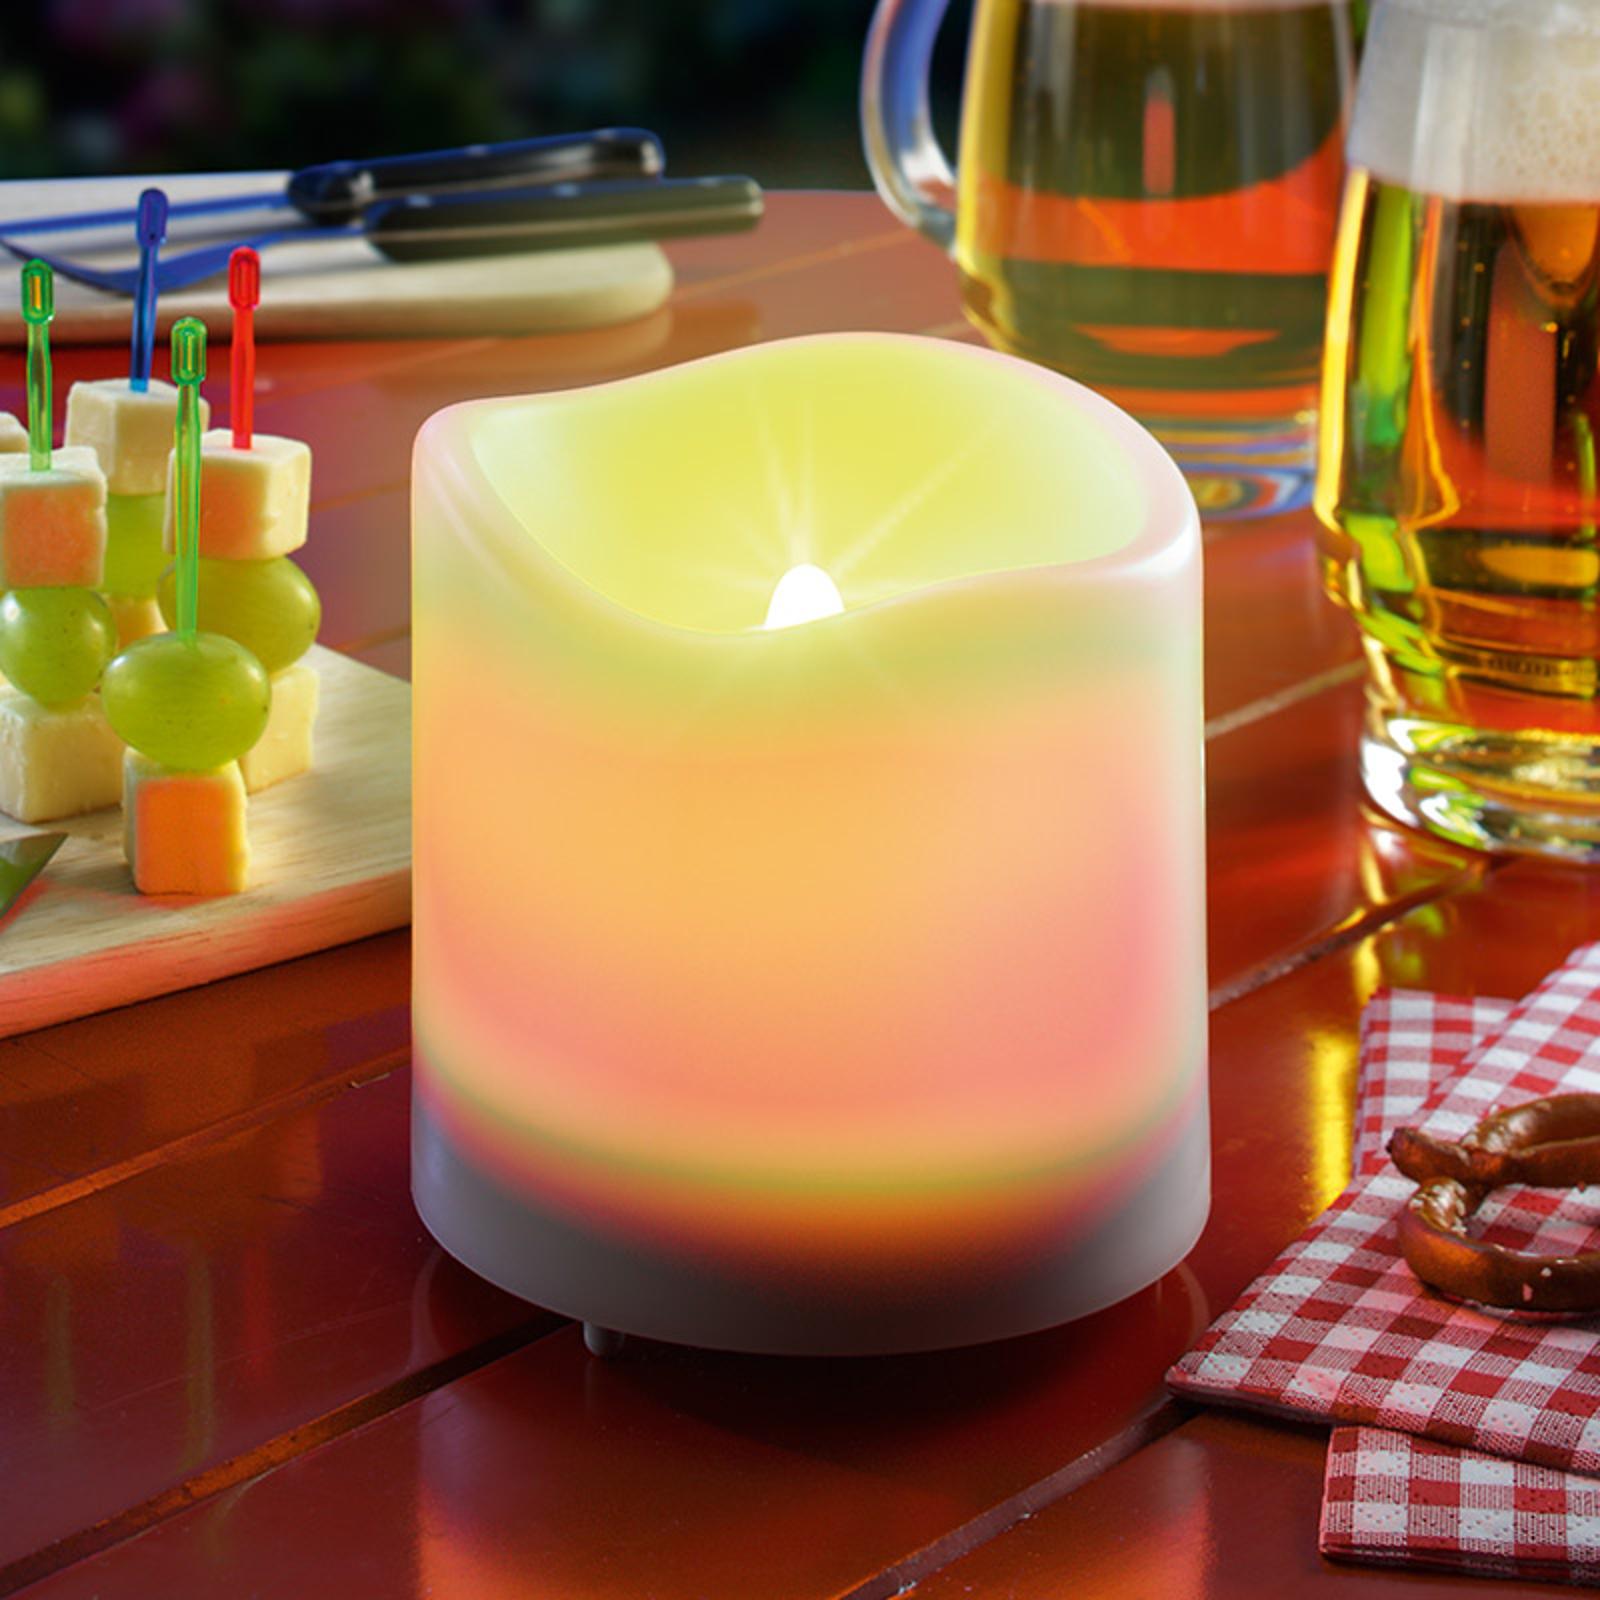 Weiße LED-Solarkerze Candle Light